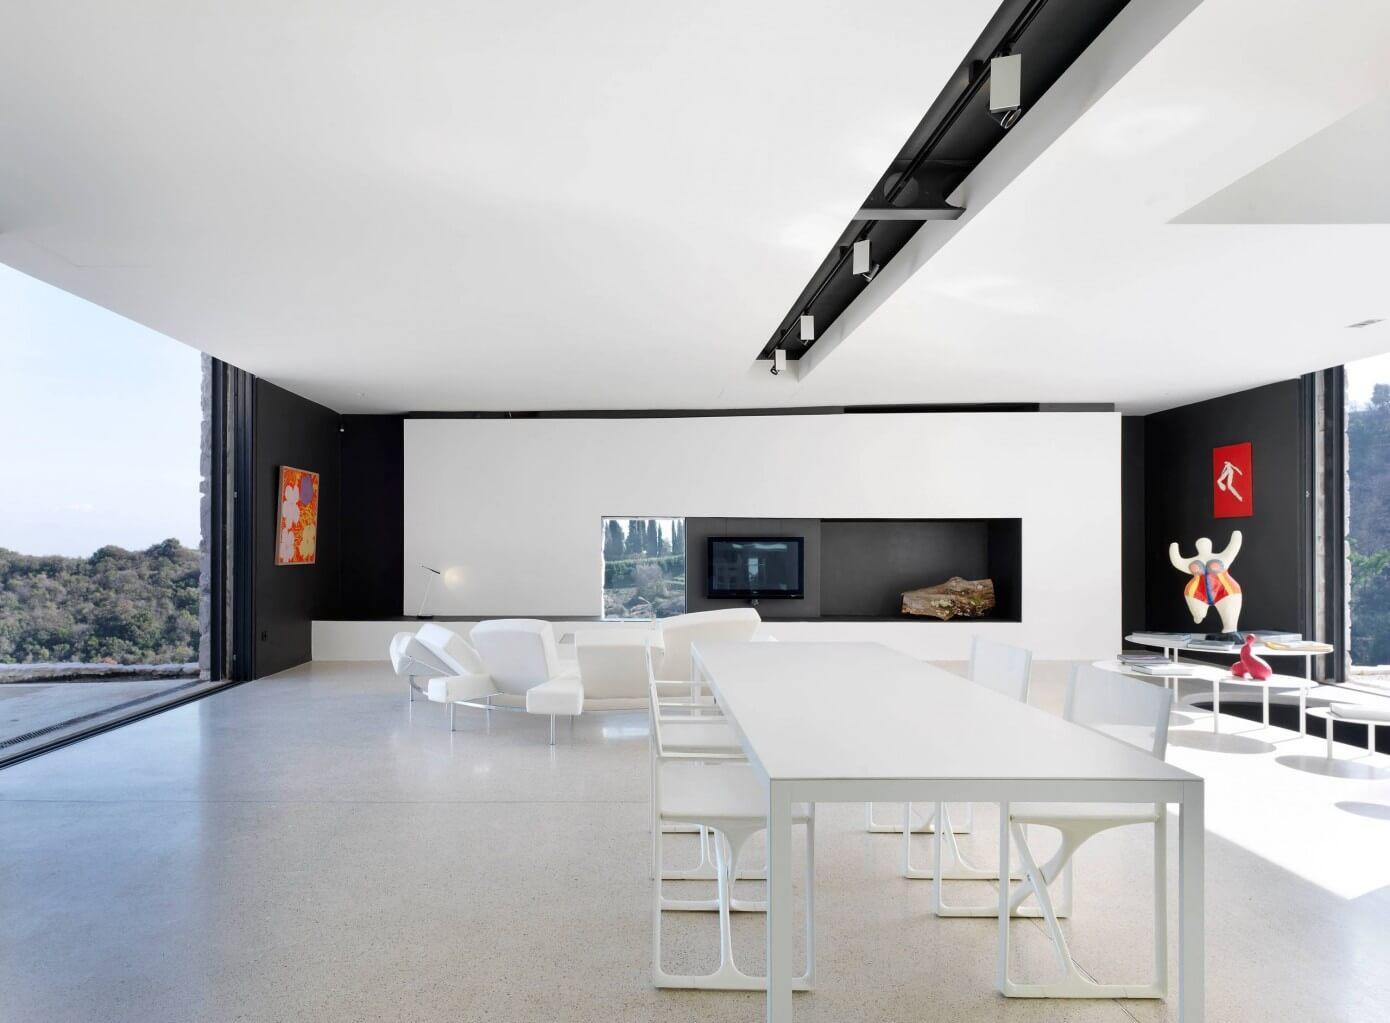 Casa farfalla by michel boucquillon homeadore for Les plus beaux salons